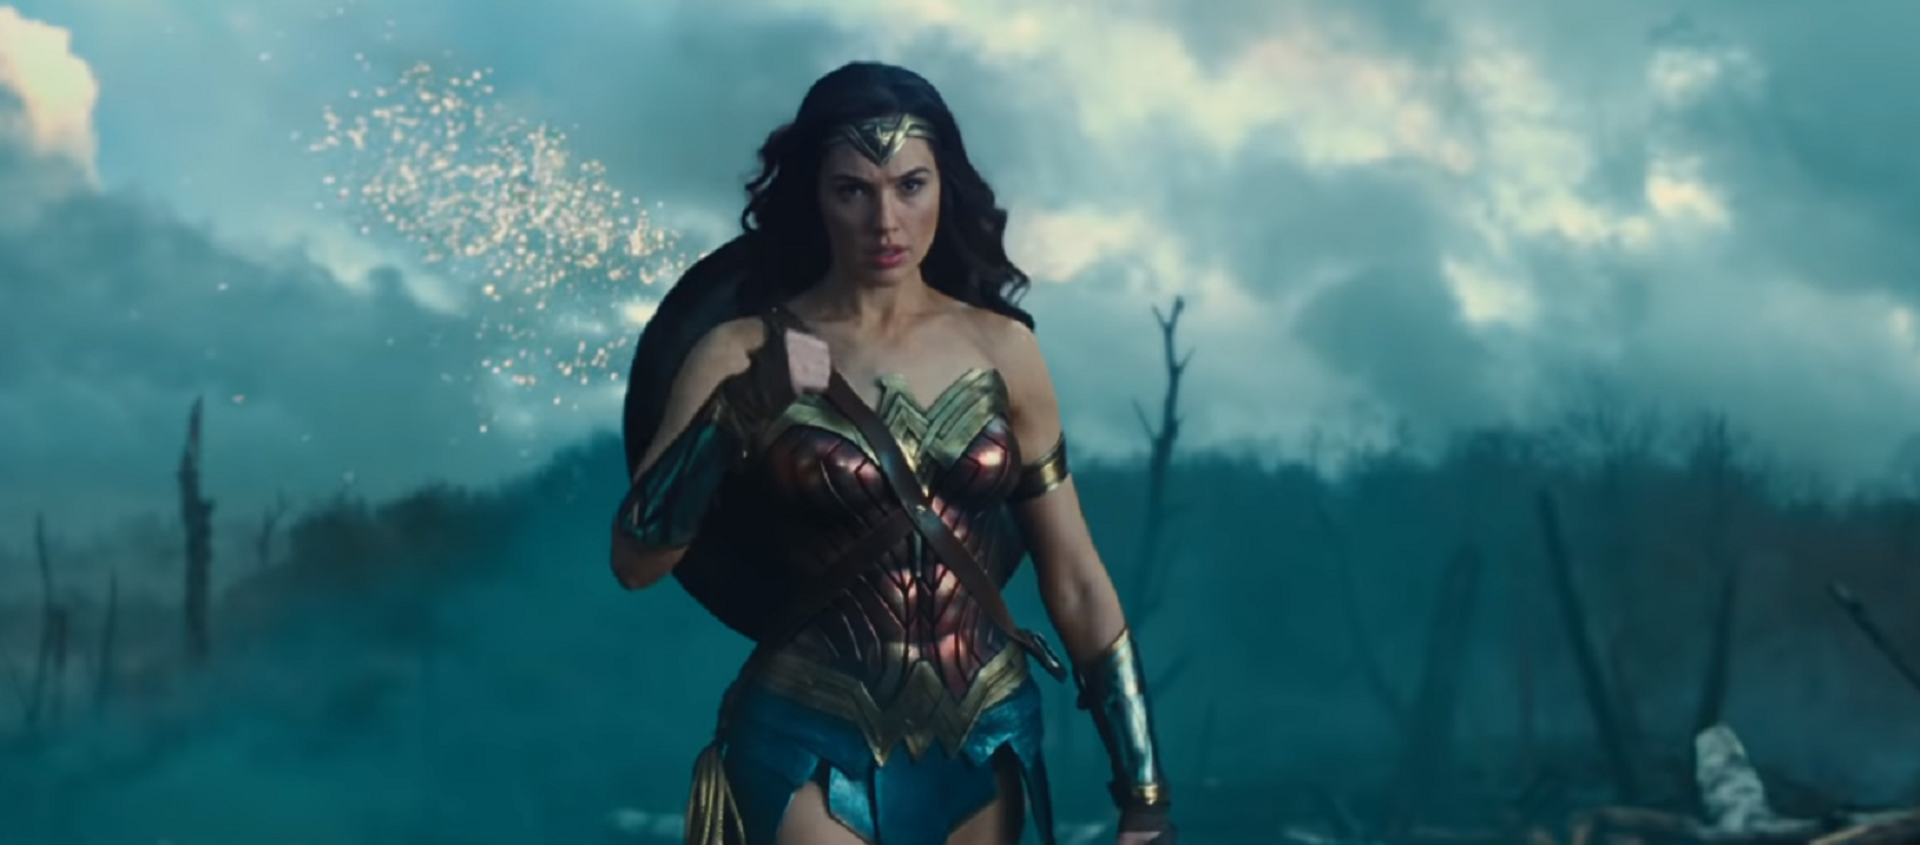 Wonder Woman, captura de pantalla - Sputnik Mundo, 1920, 18.11.2019